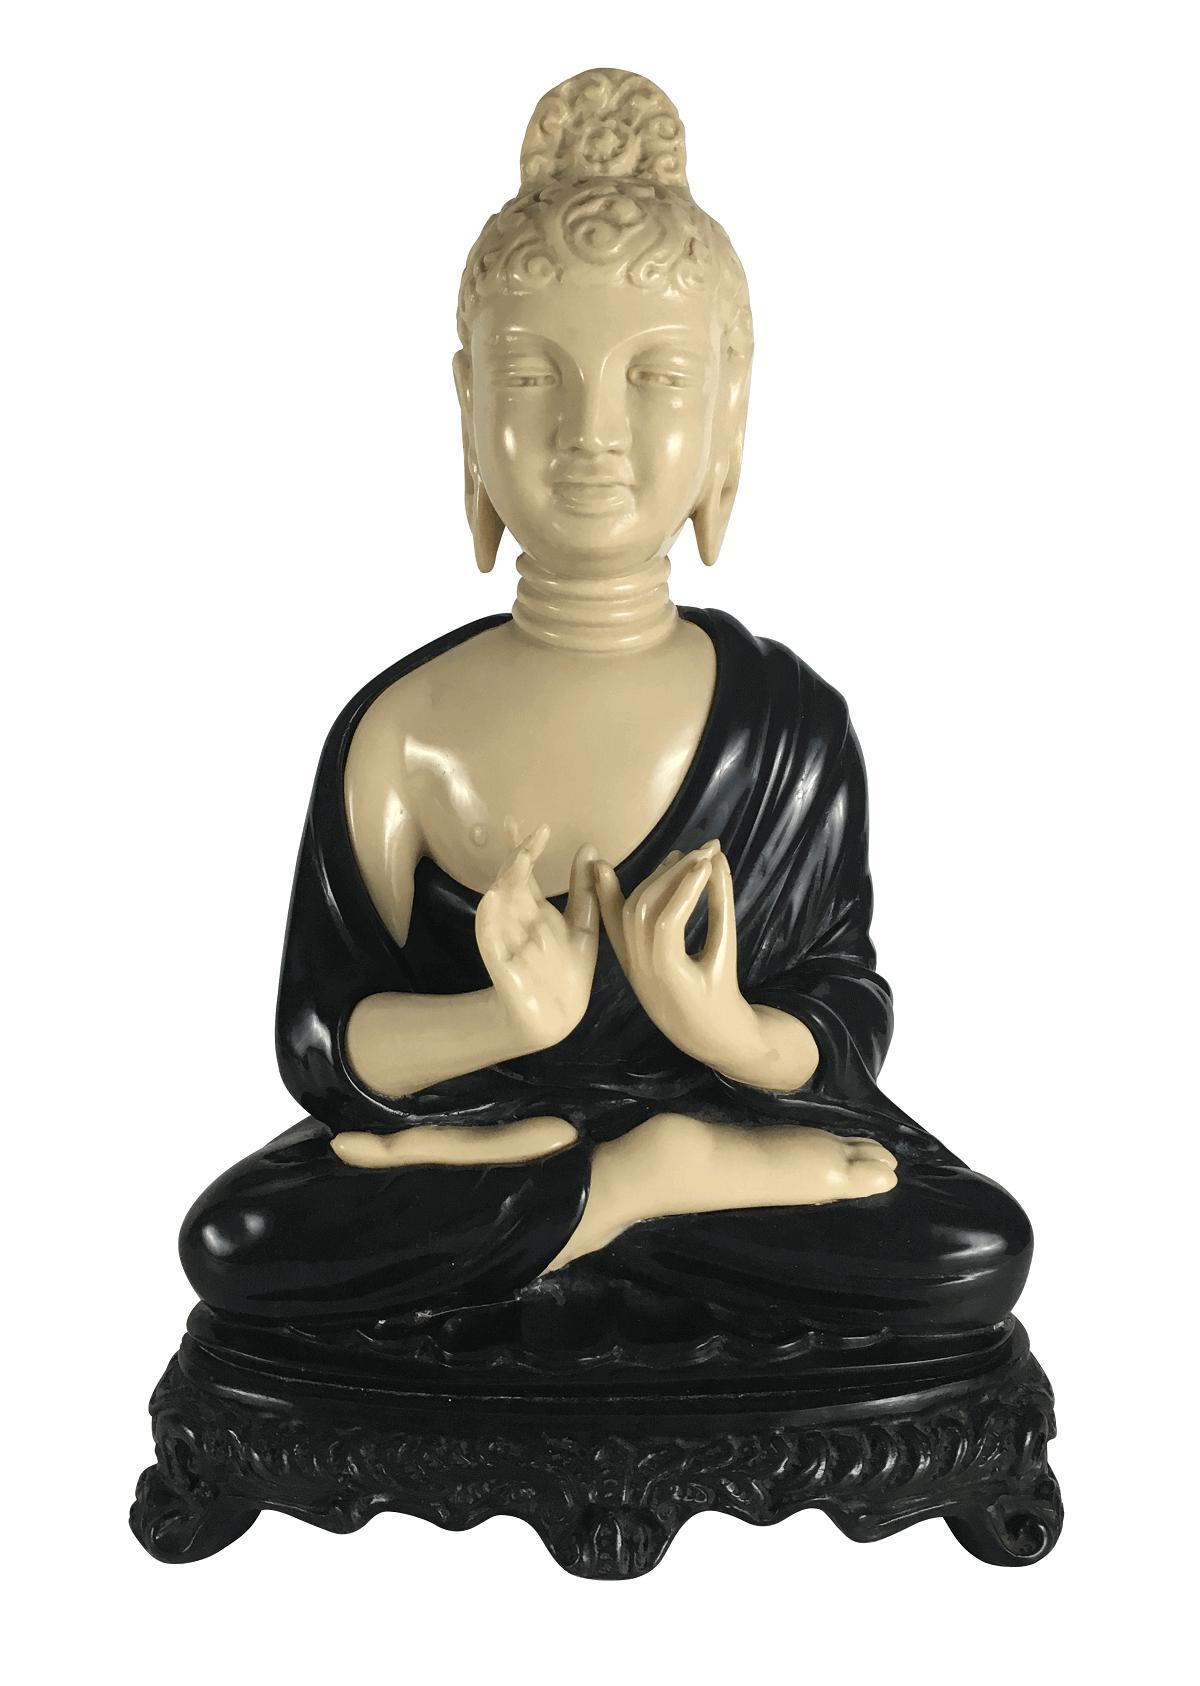 Grande Buda Hindu Tailandes Em Resina 42cm